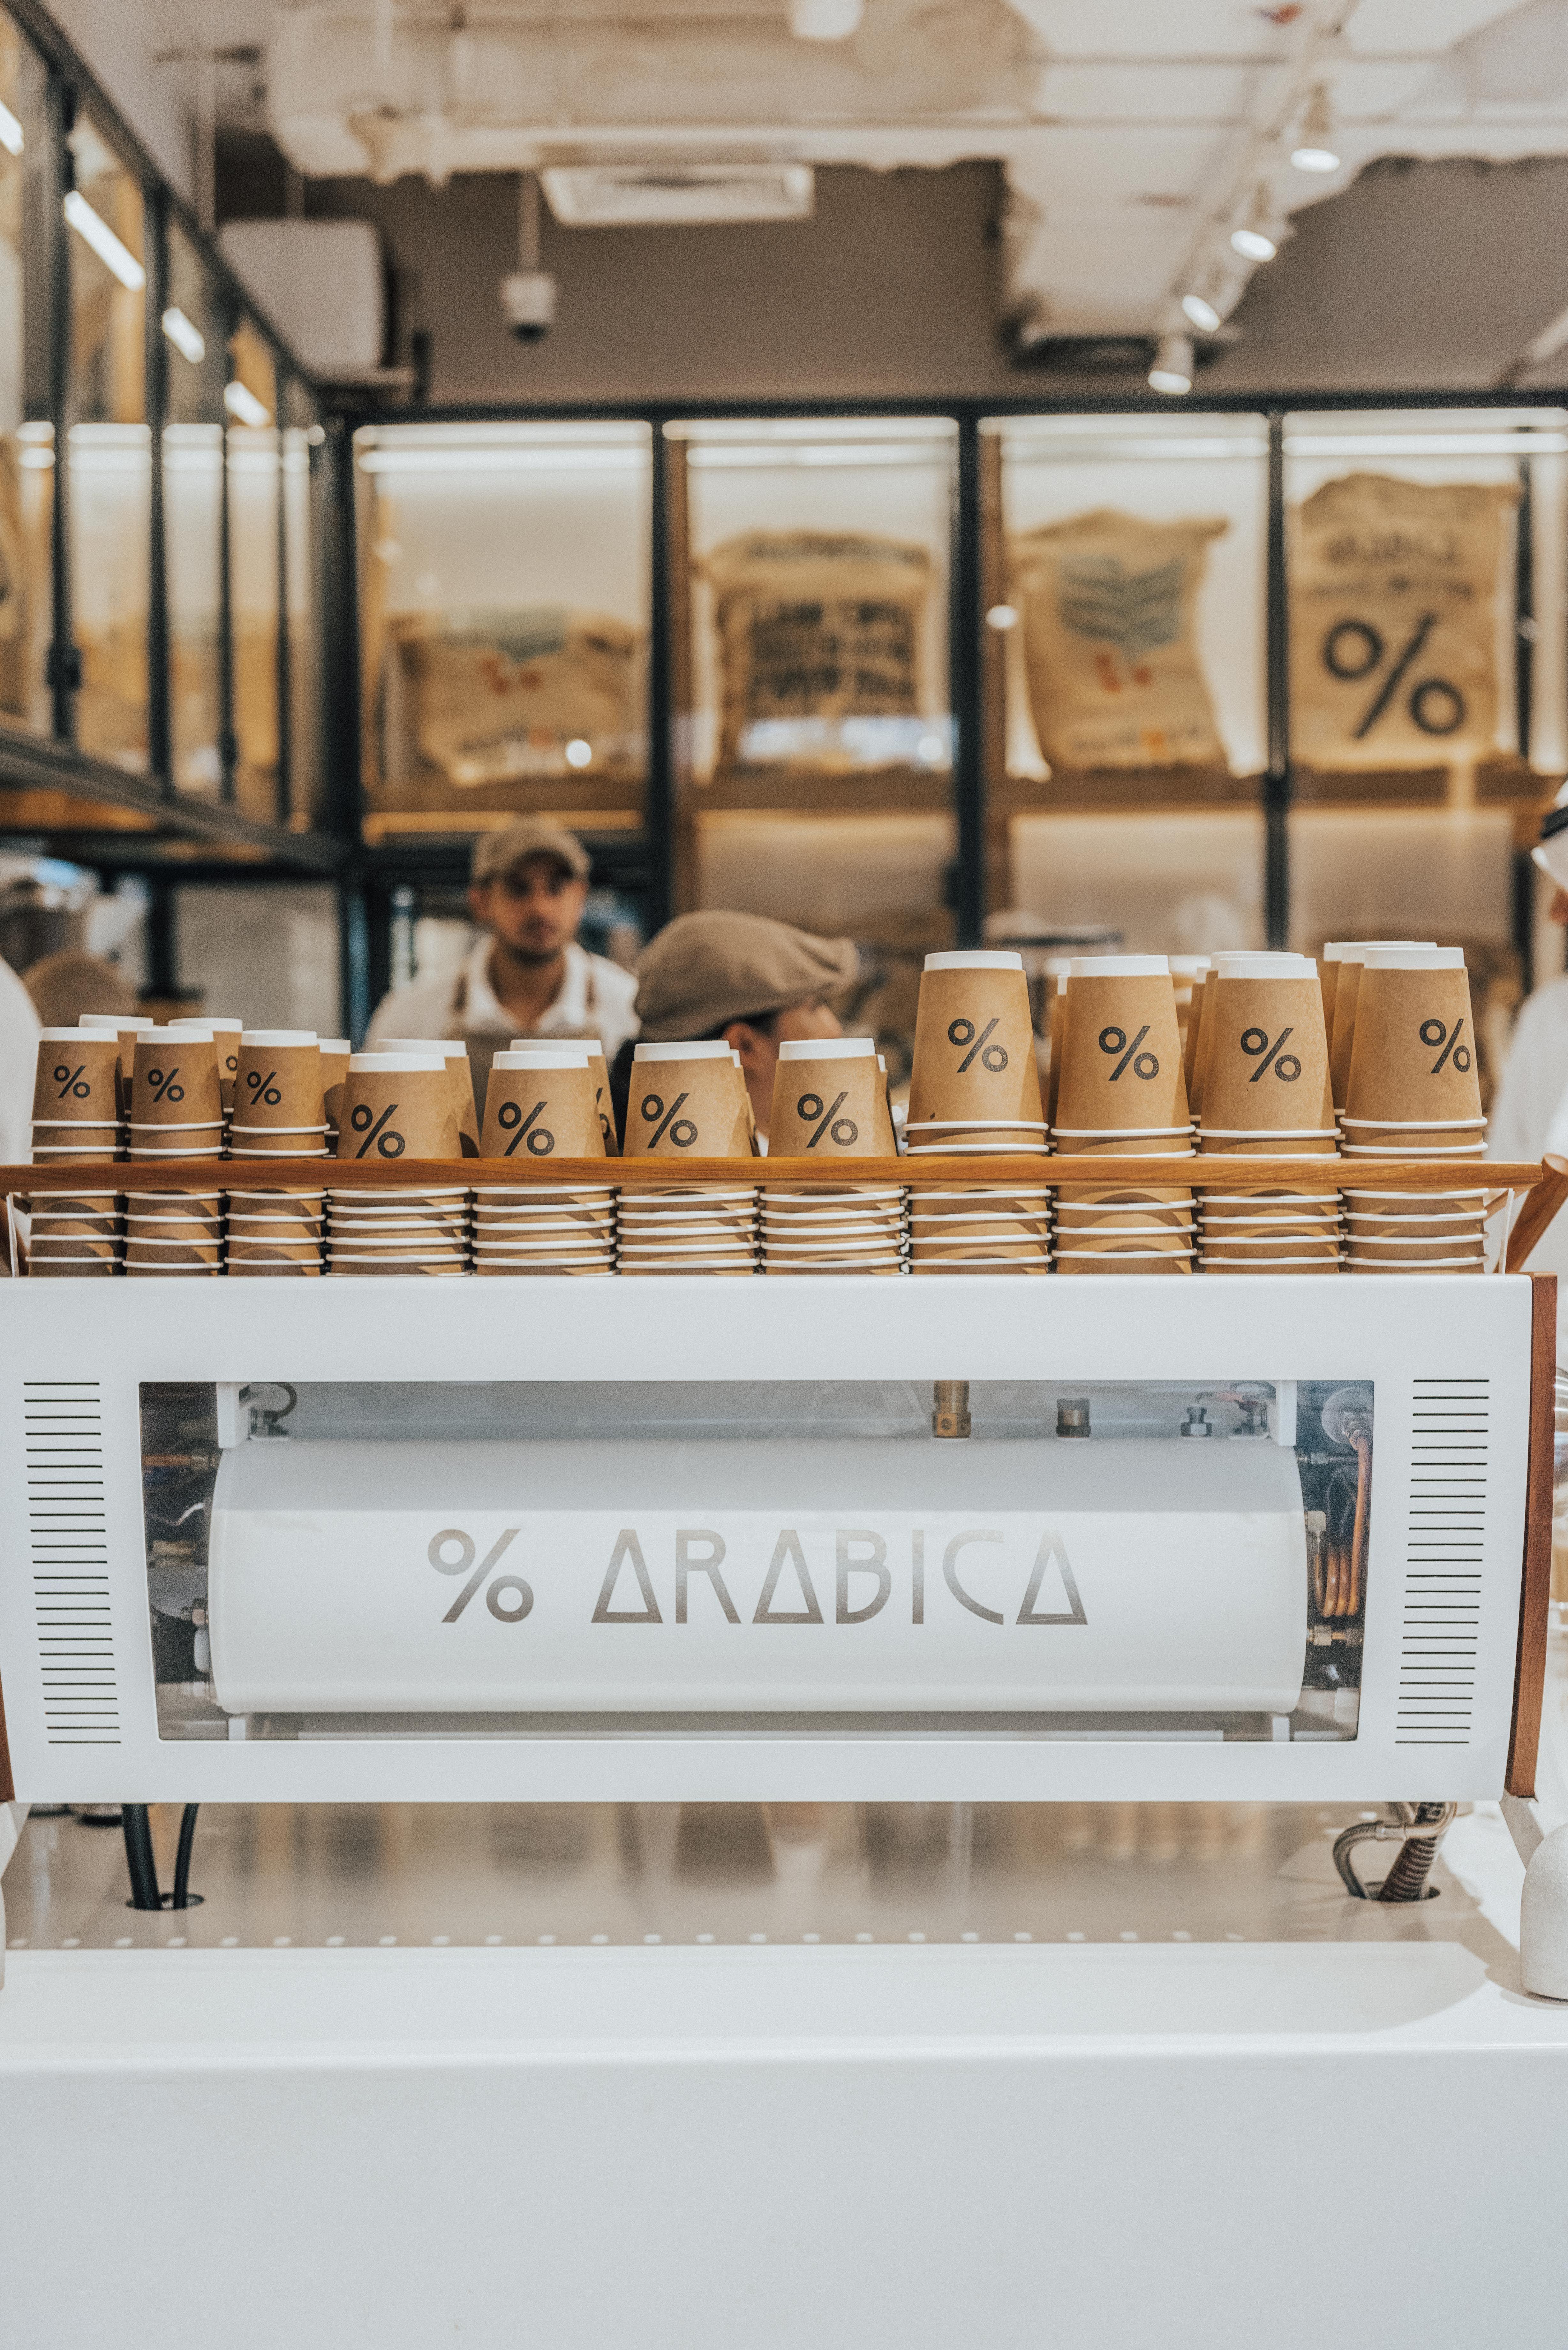 48 Hours in Abu Dhabi Abu dhabi, Coffee break catering